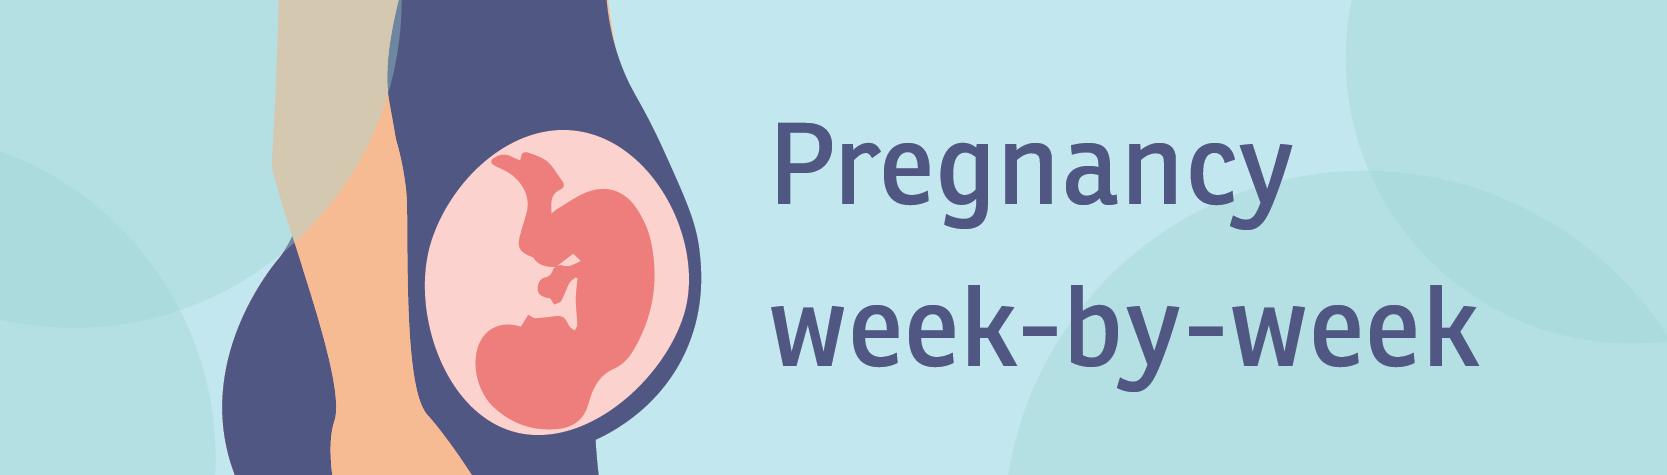 Week pregnancy trimester breakdown Pregnancy